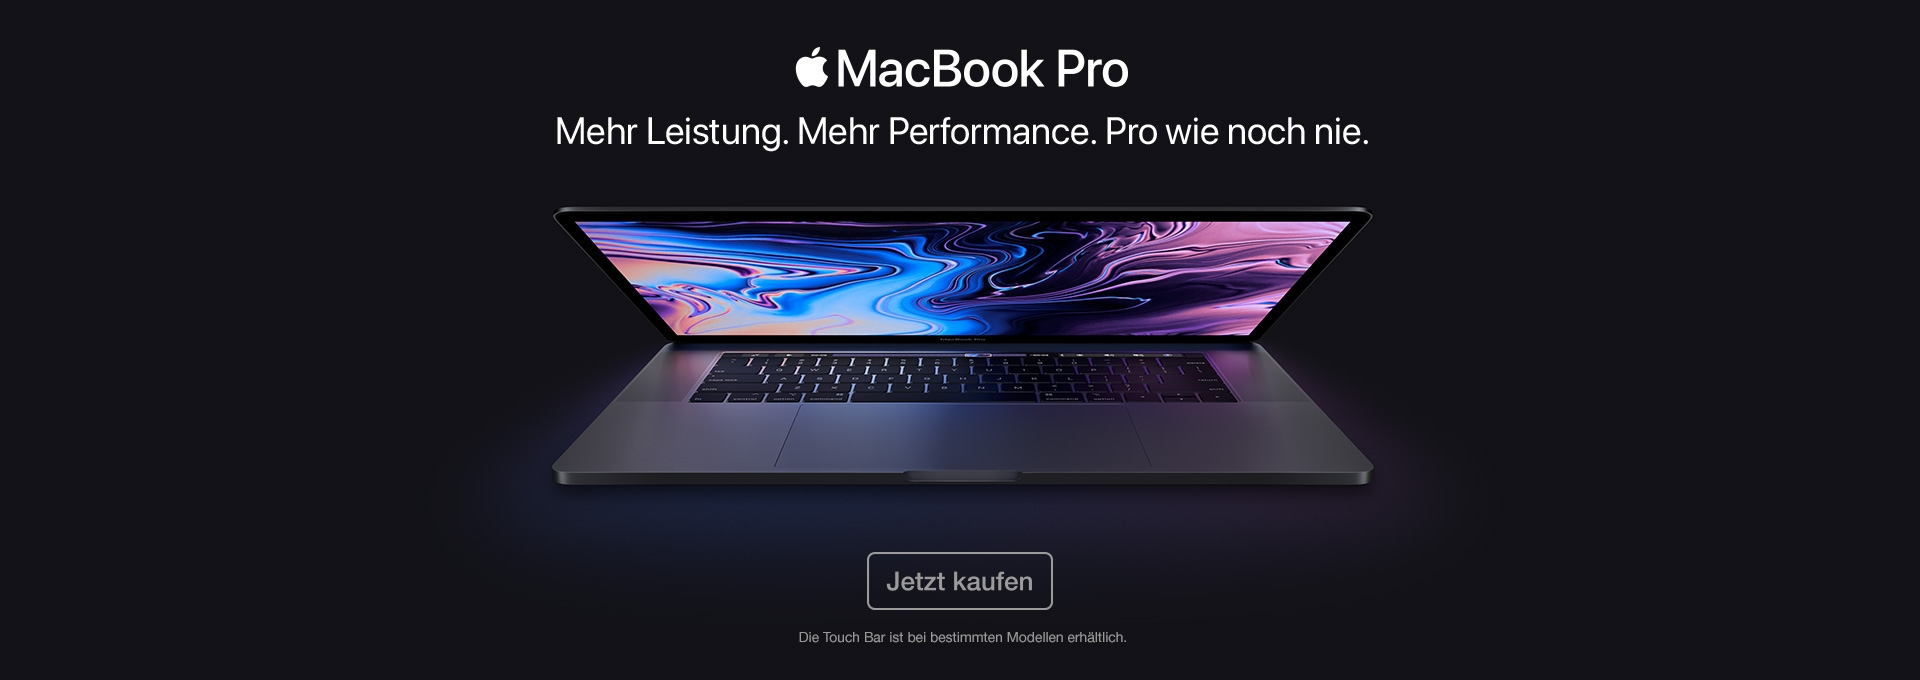 MacBook Pro Mid 2018